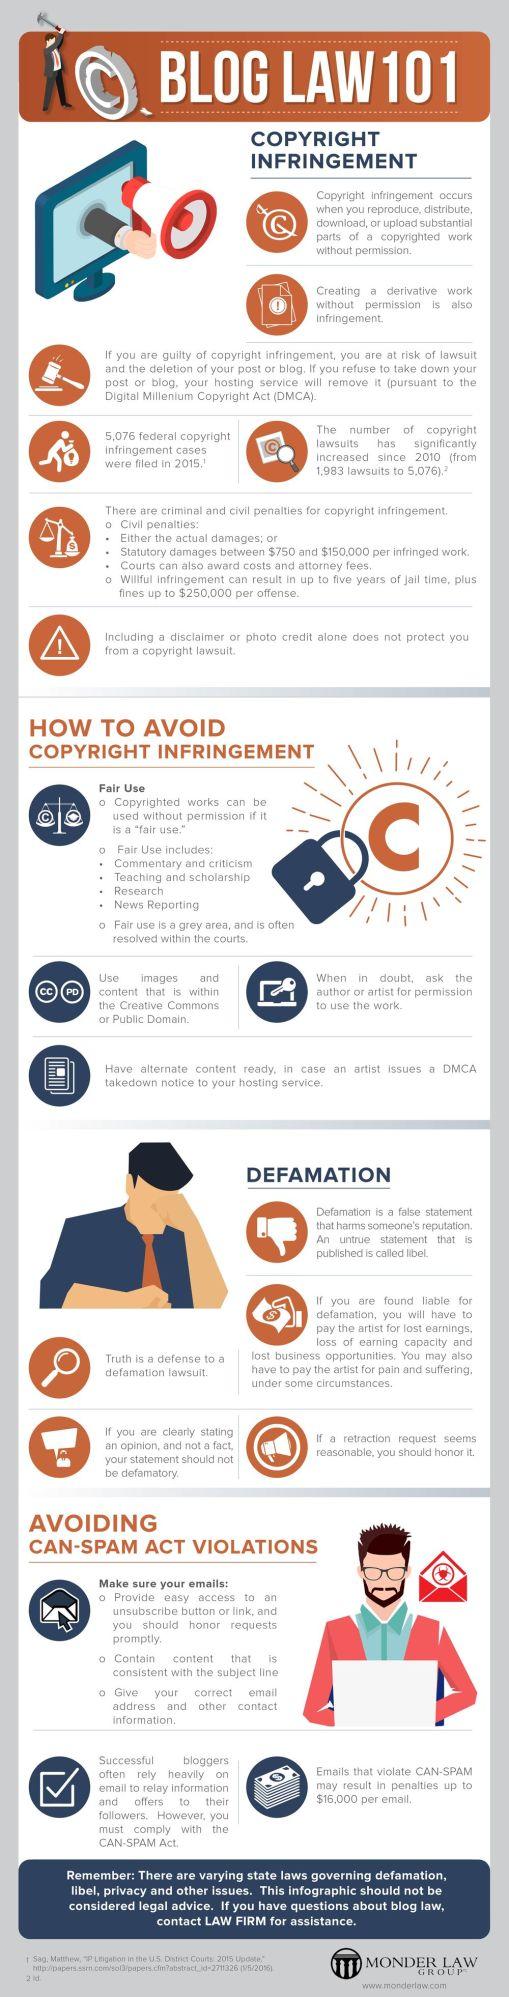 How-to-avoid-copyright-infringement-full-infographic